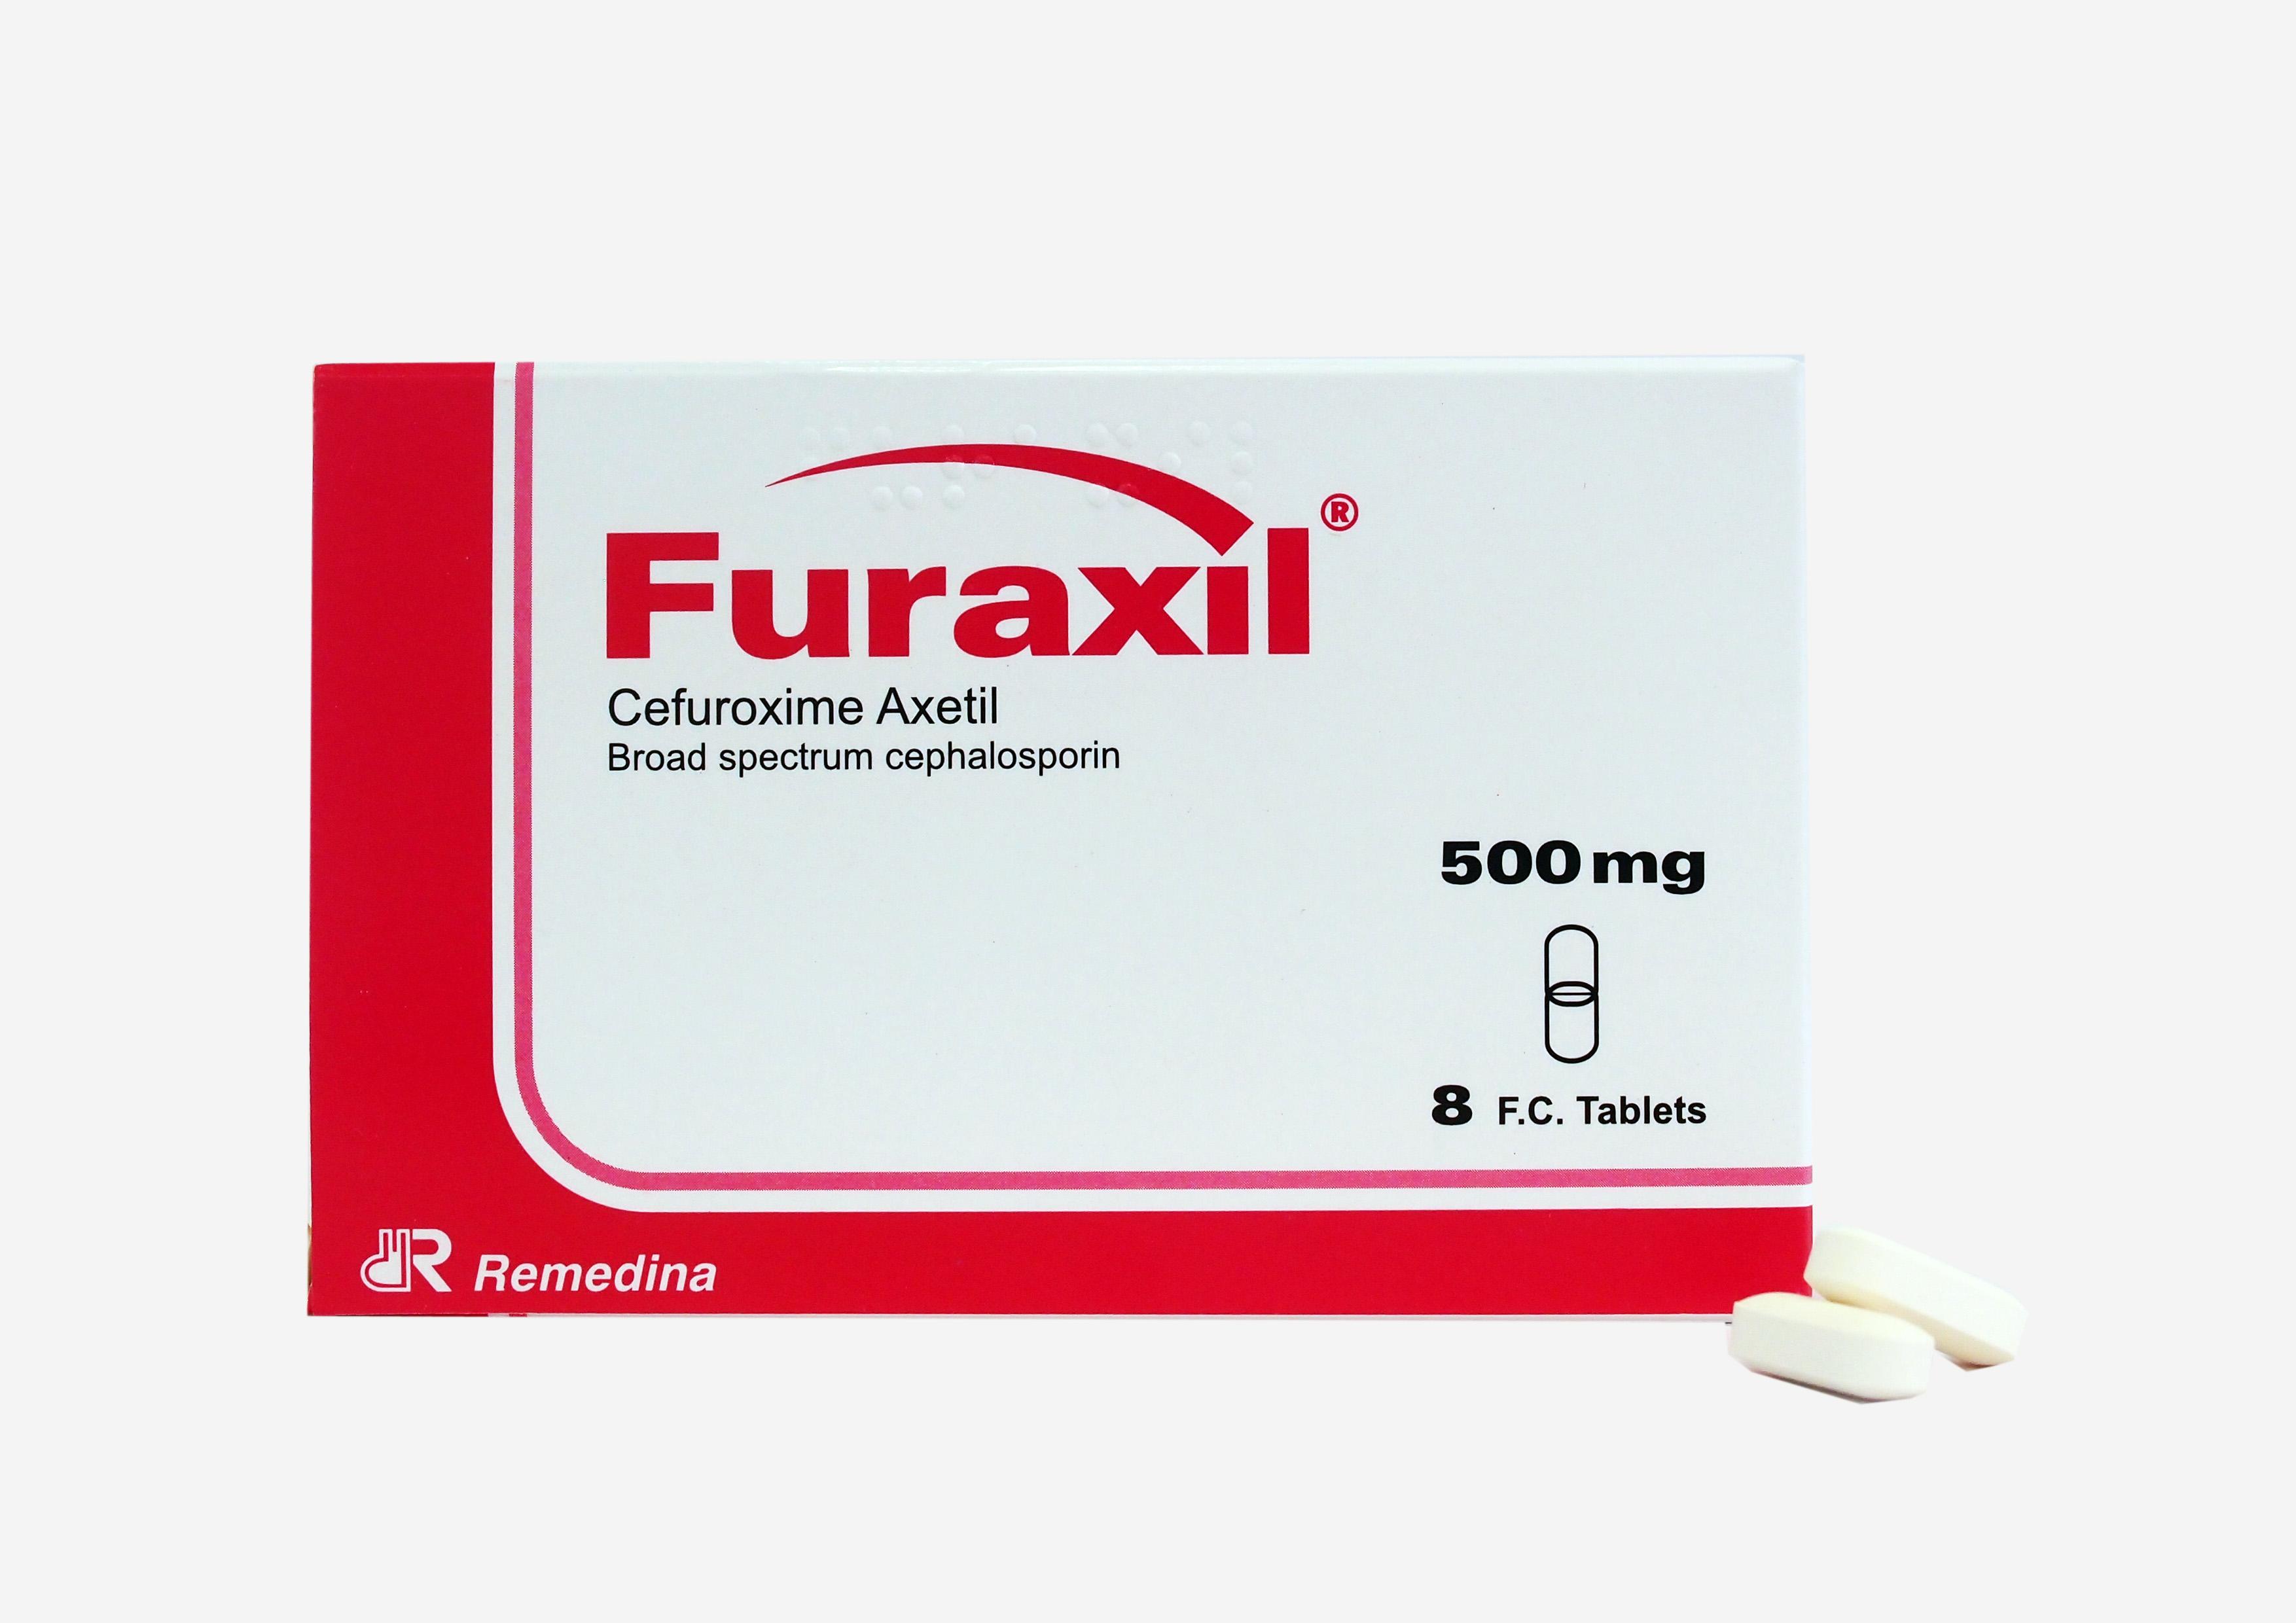 Furaxil 500mg